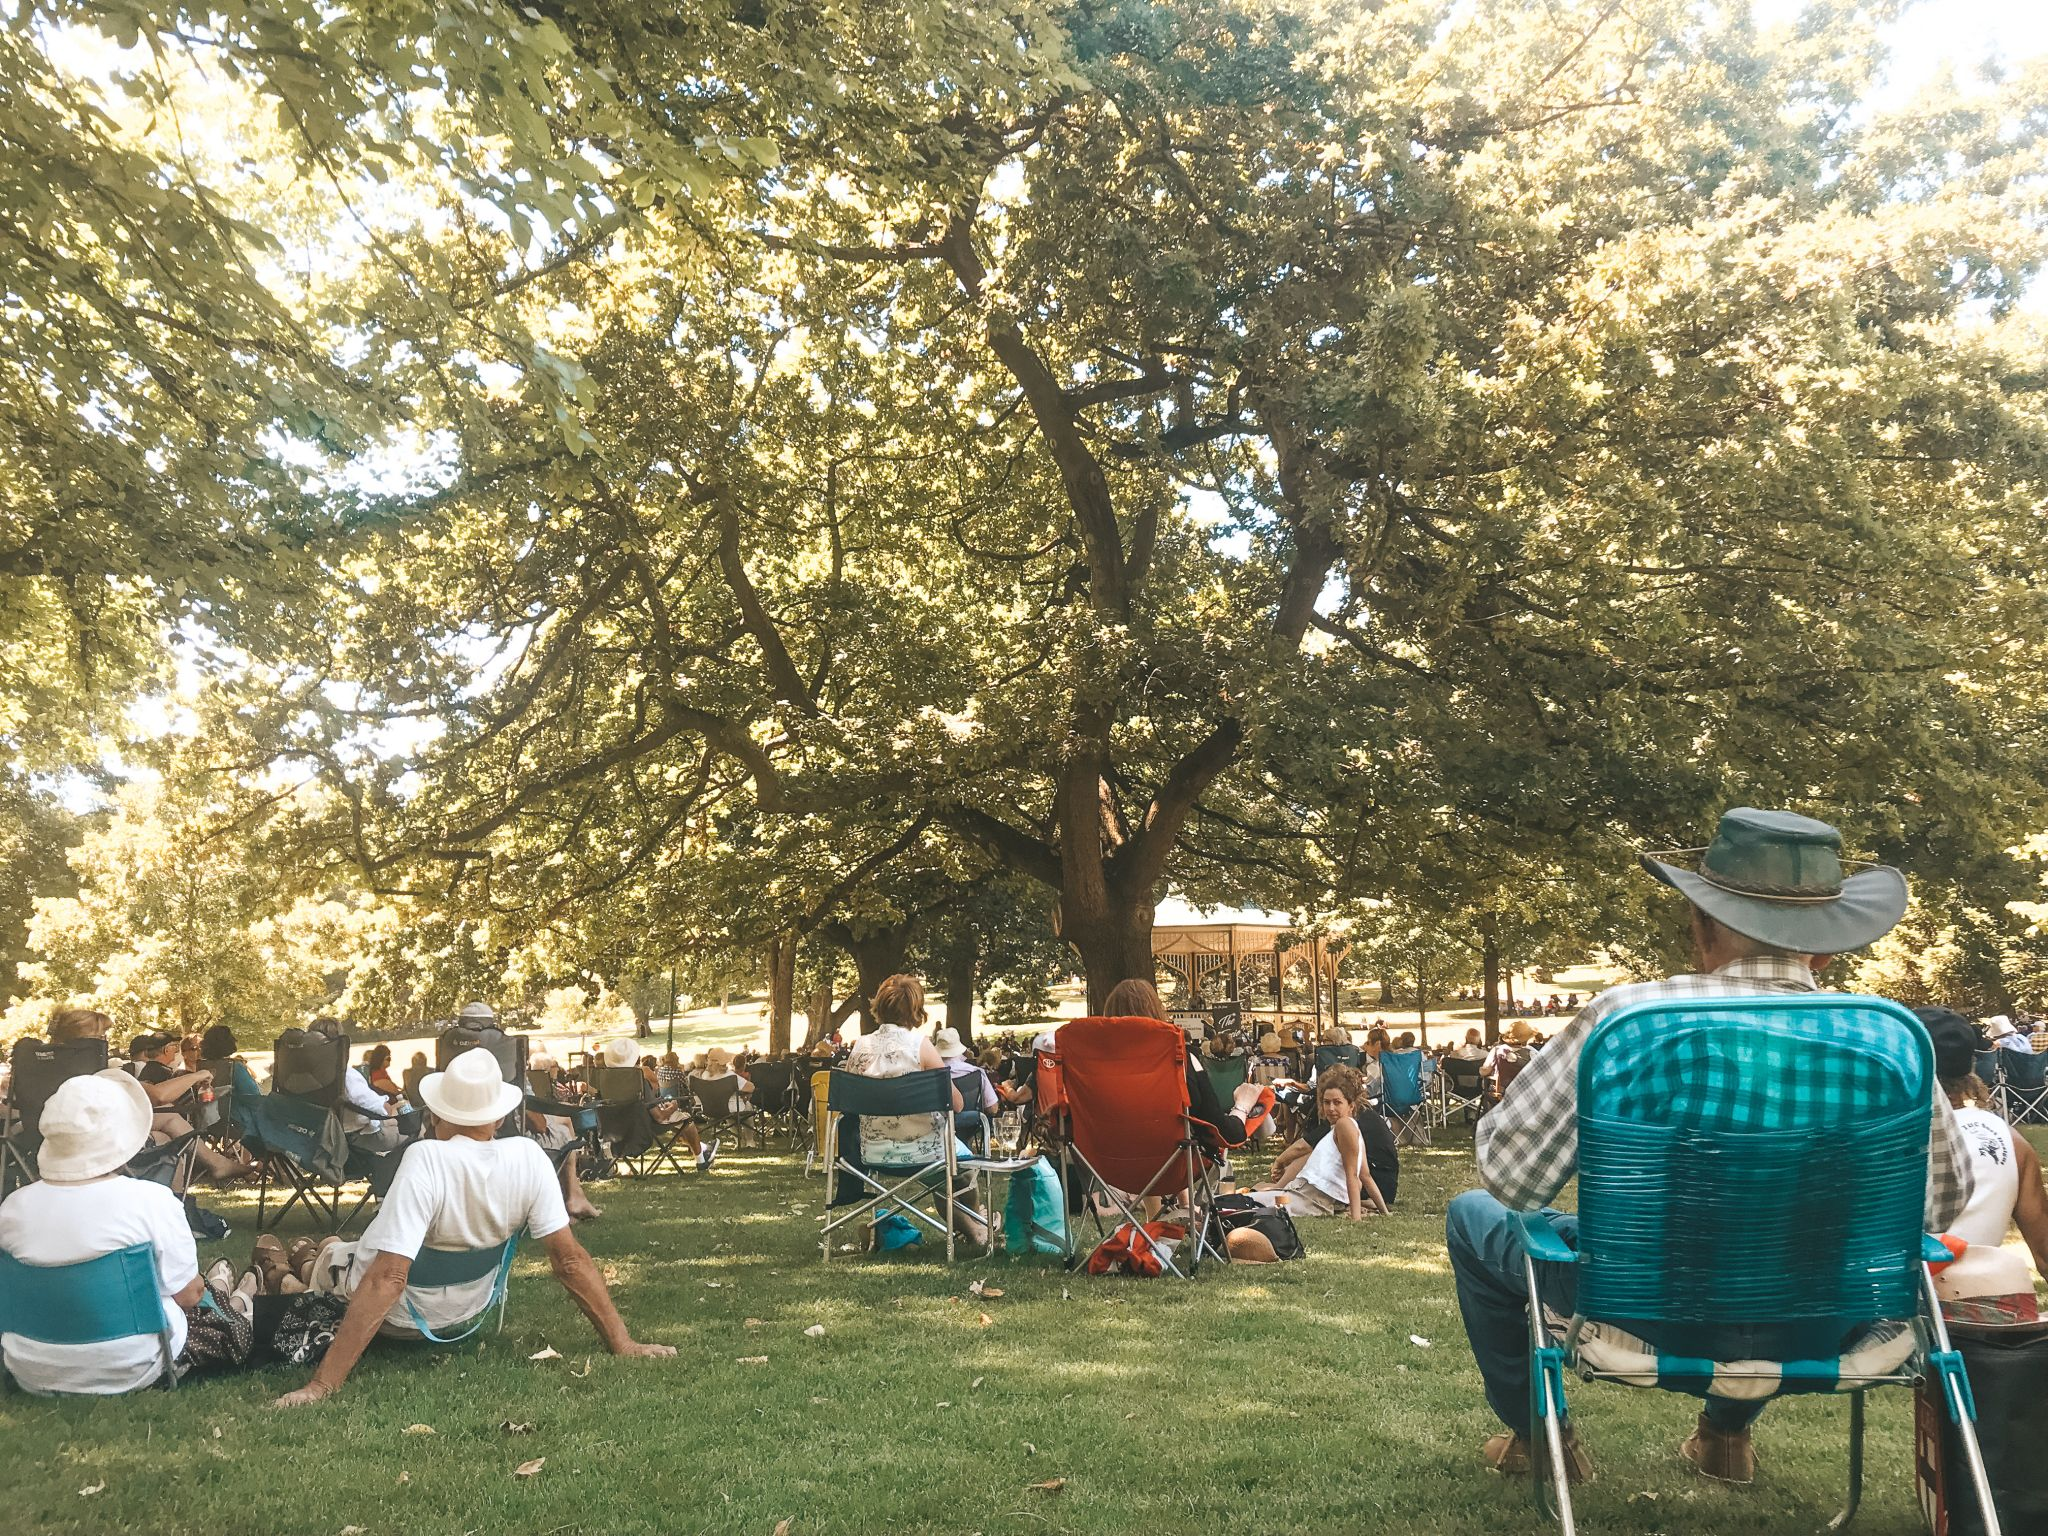 jana meerman city park launceston (1)